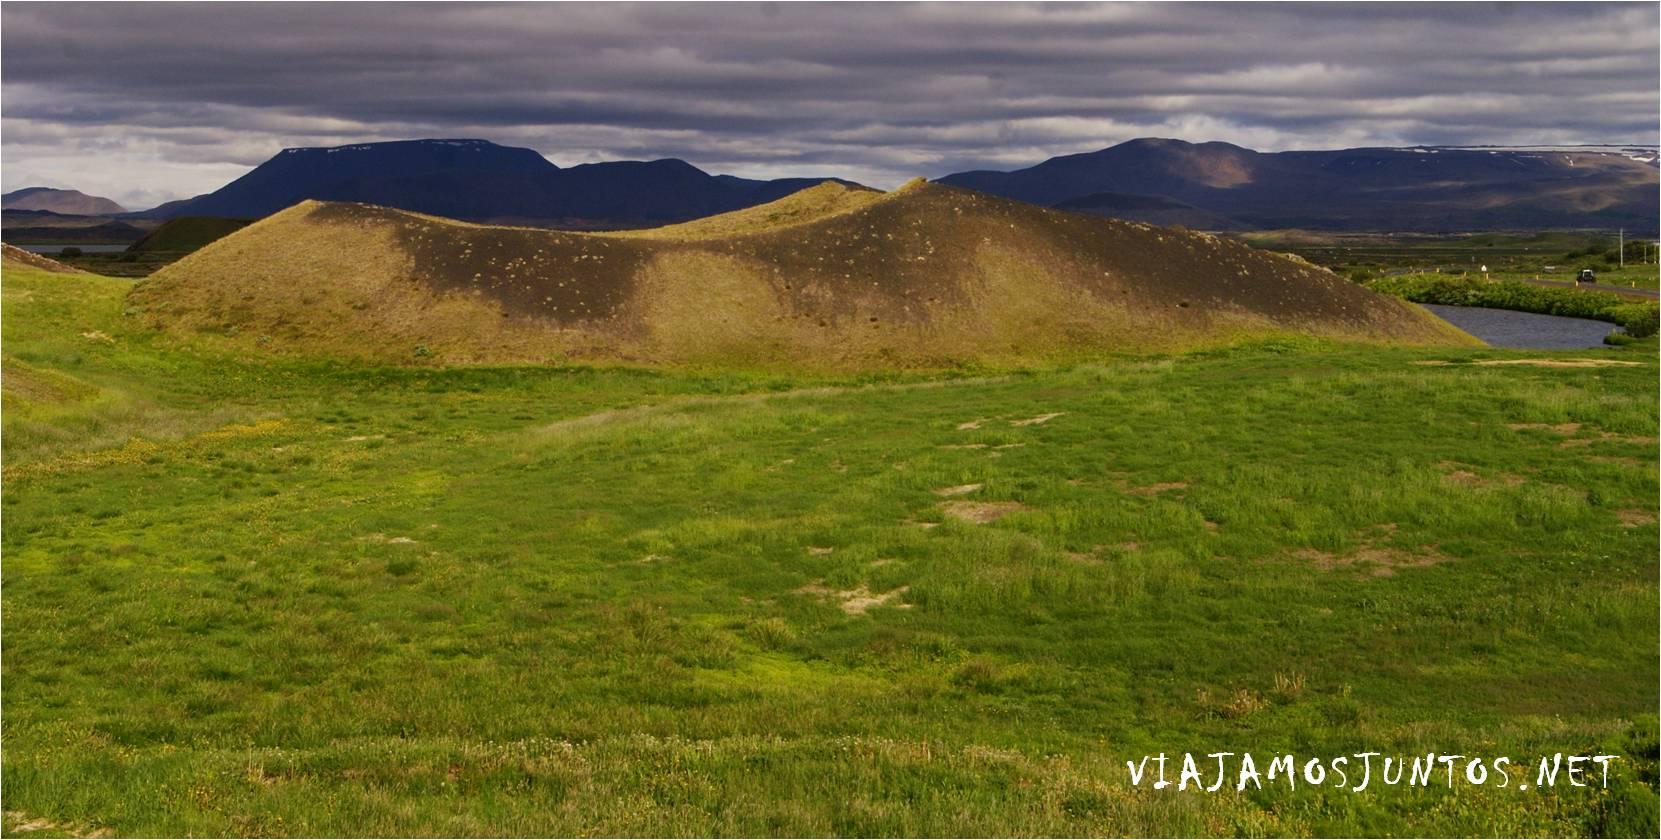 Myvatn, Cráteres falsos, Stakholstjorn, Skutustadir, pseudo cráteres, crateres, volcanes, Islandia, Iceland, rutas, curiosidades